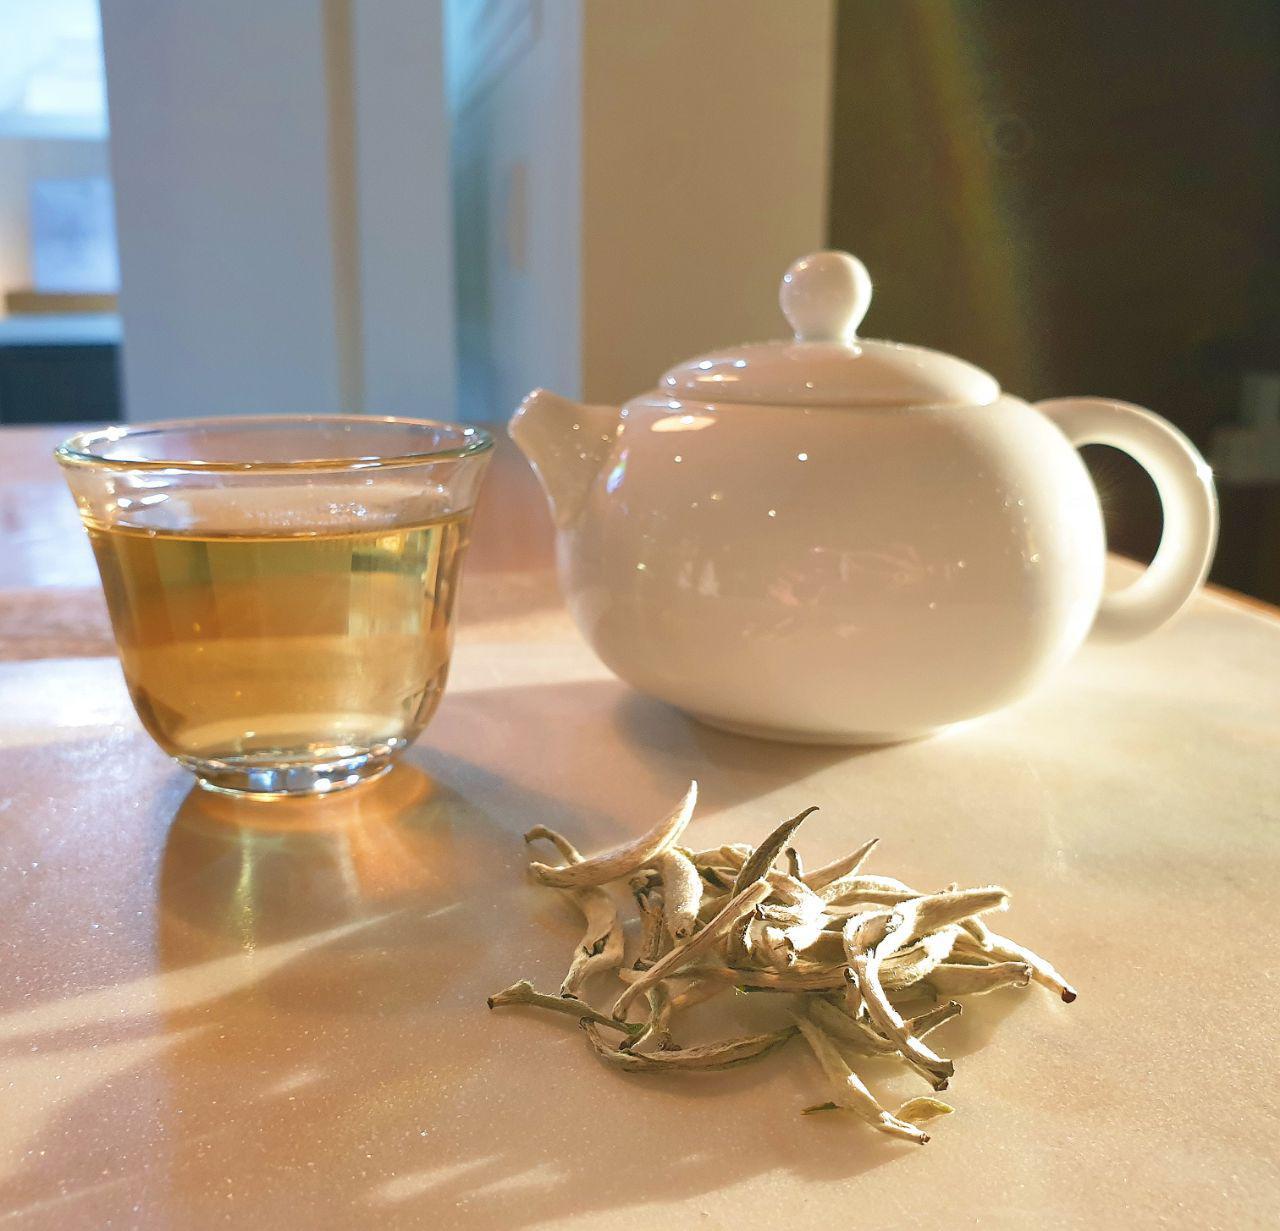 GAIL_Afternoon white tea.jpg